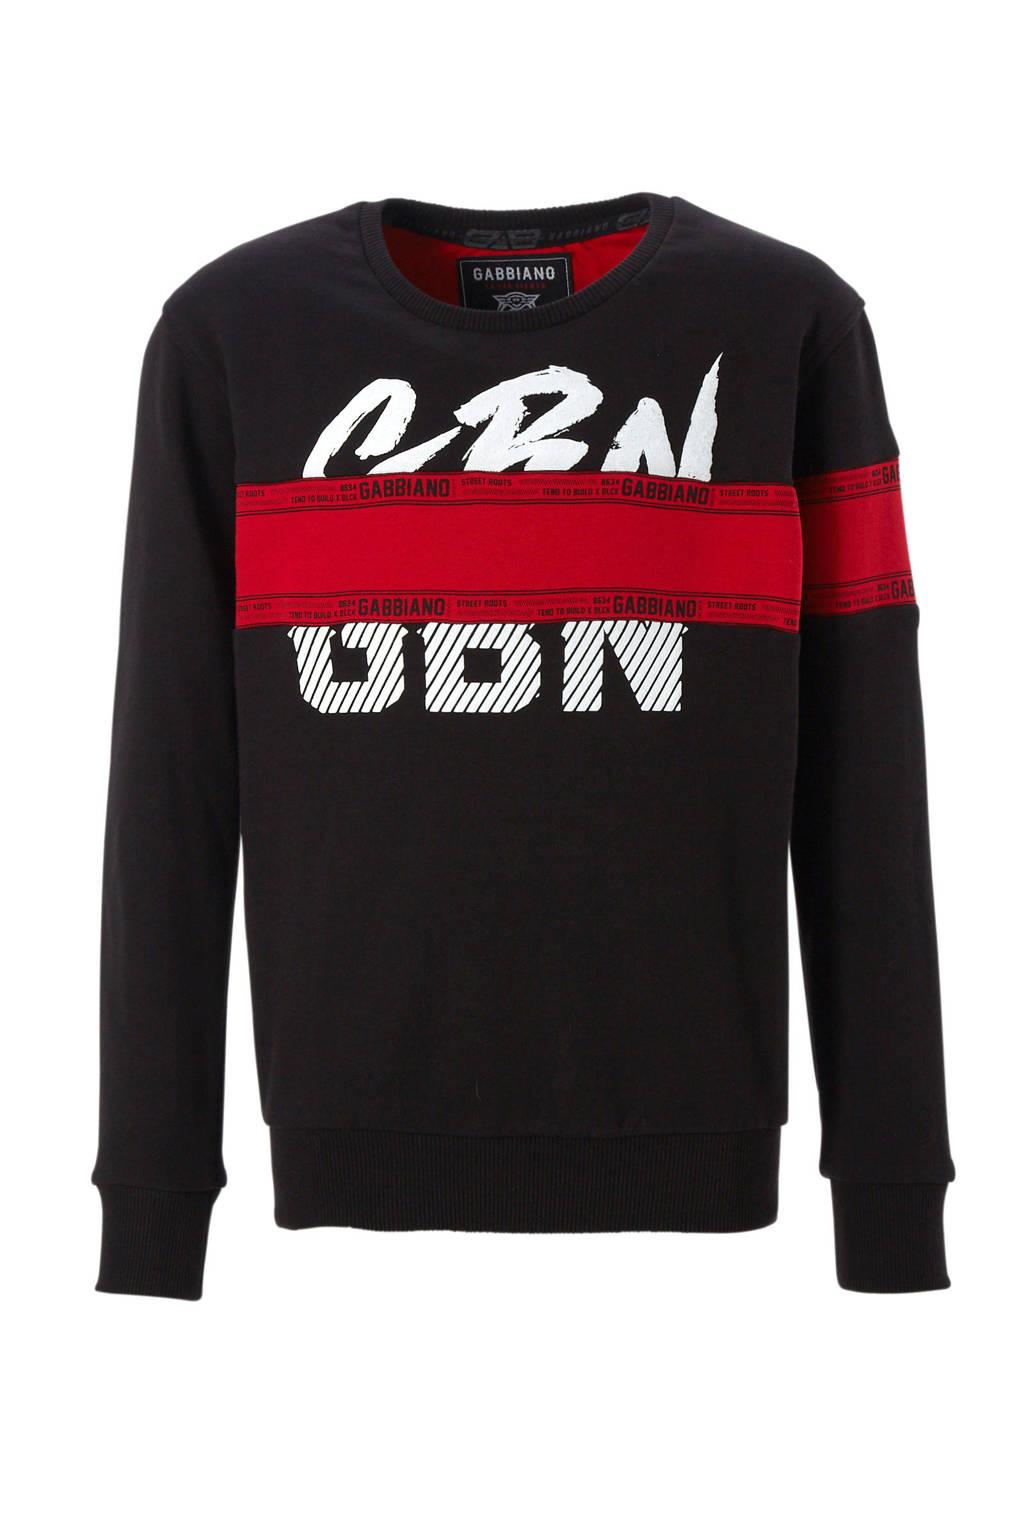 GABBIANO sweater met printopdruk zwart, Zwart/rood/wit